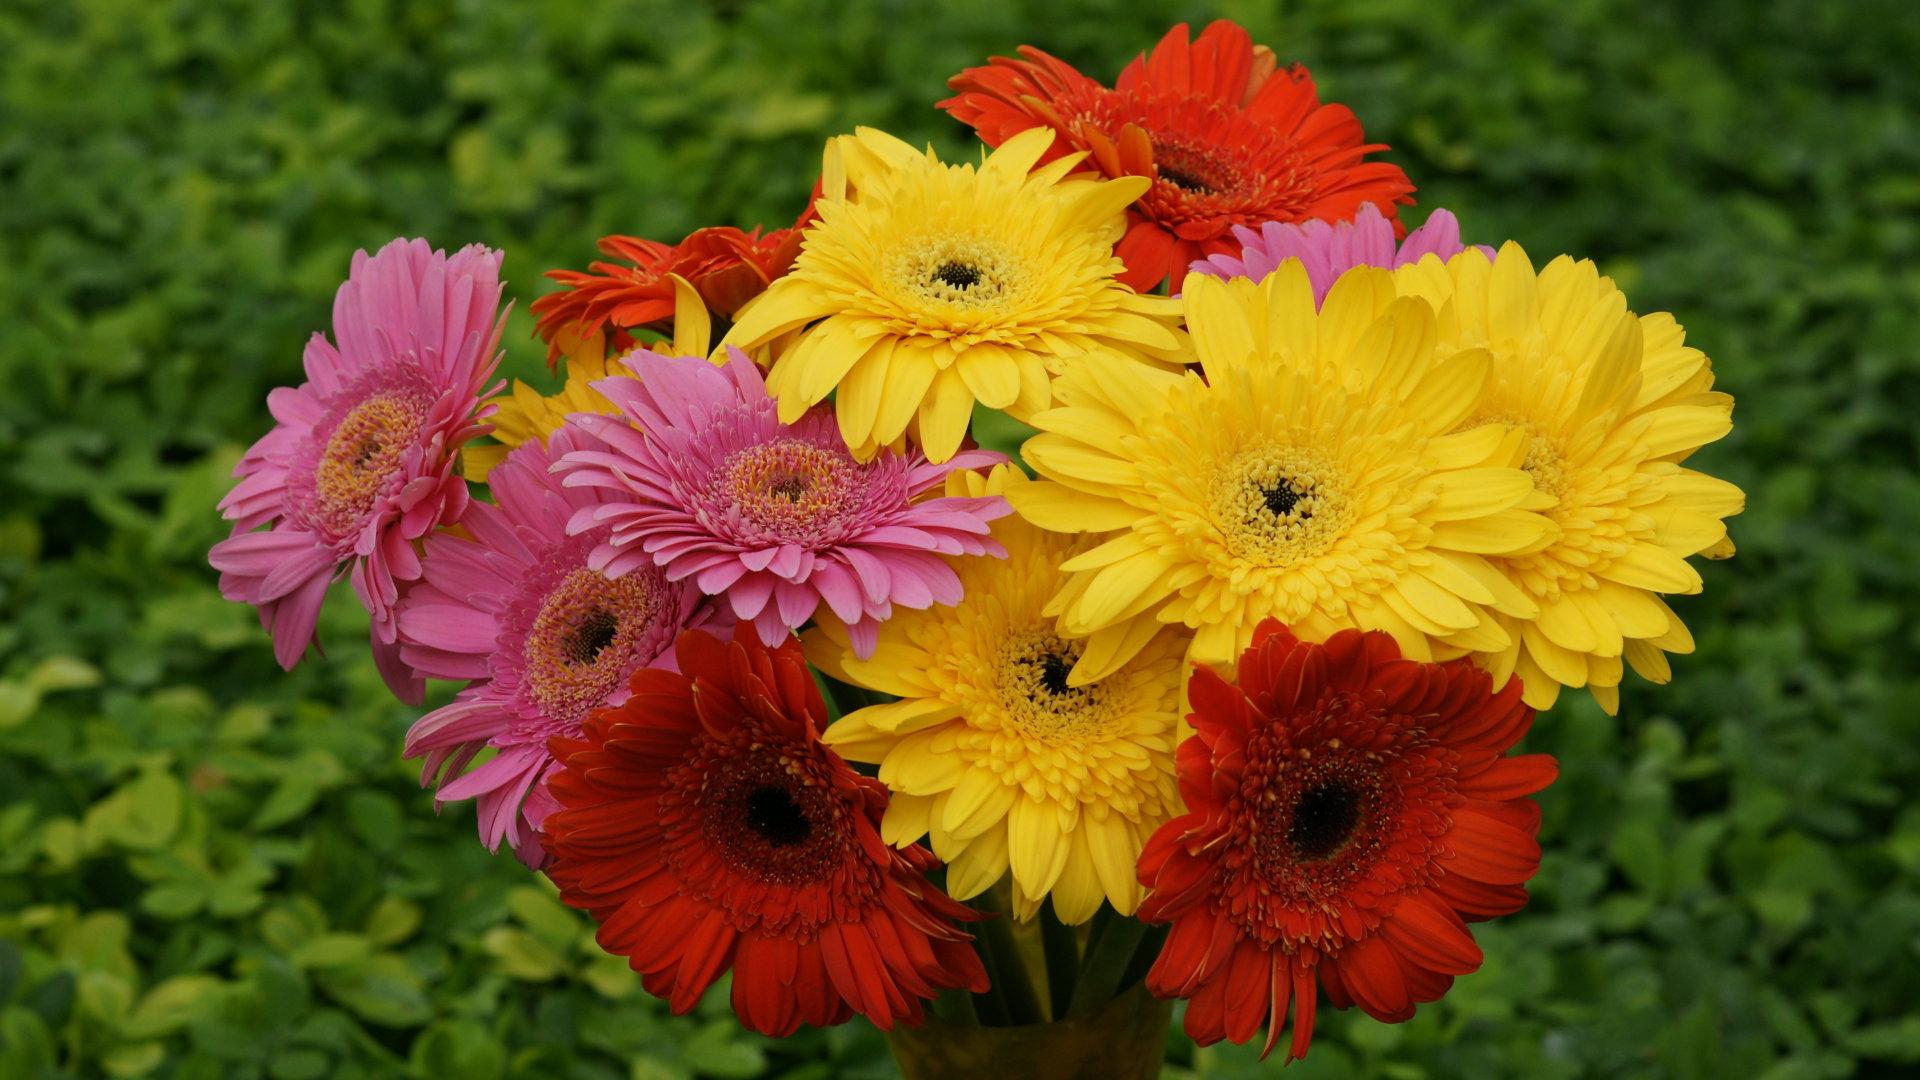 floral gerbera flower image